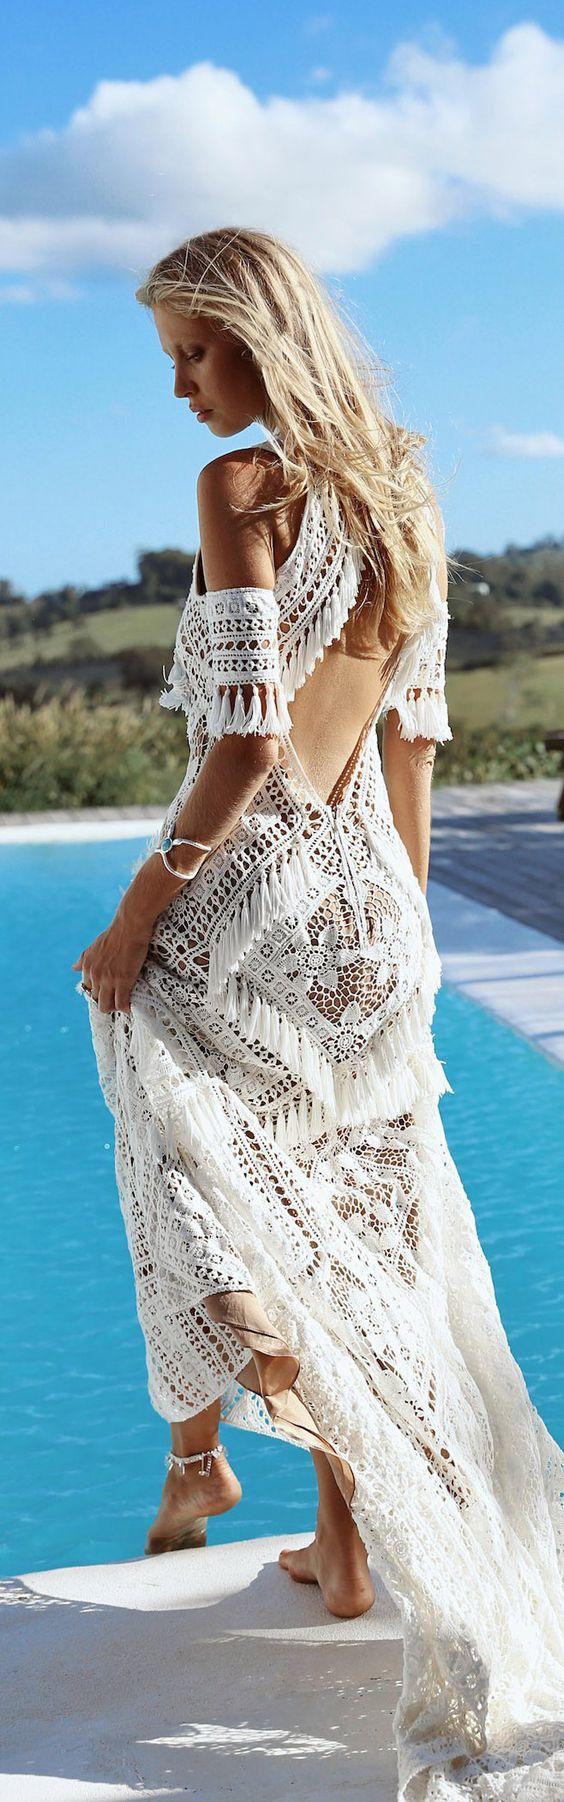 Bohemian wedding dress #weloveboho#boho#bohemian#gypsy#freespirit#fashion#wedding